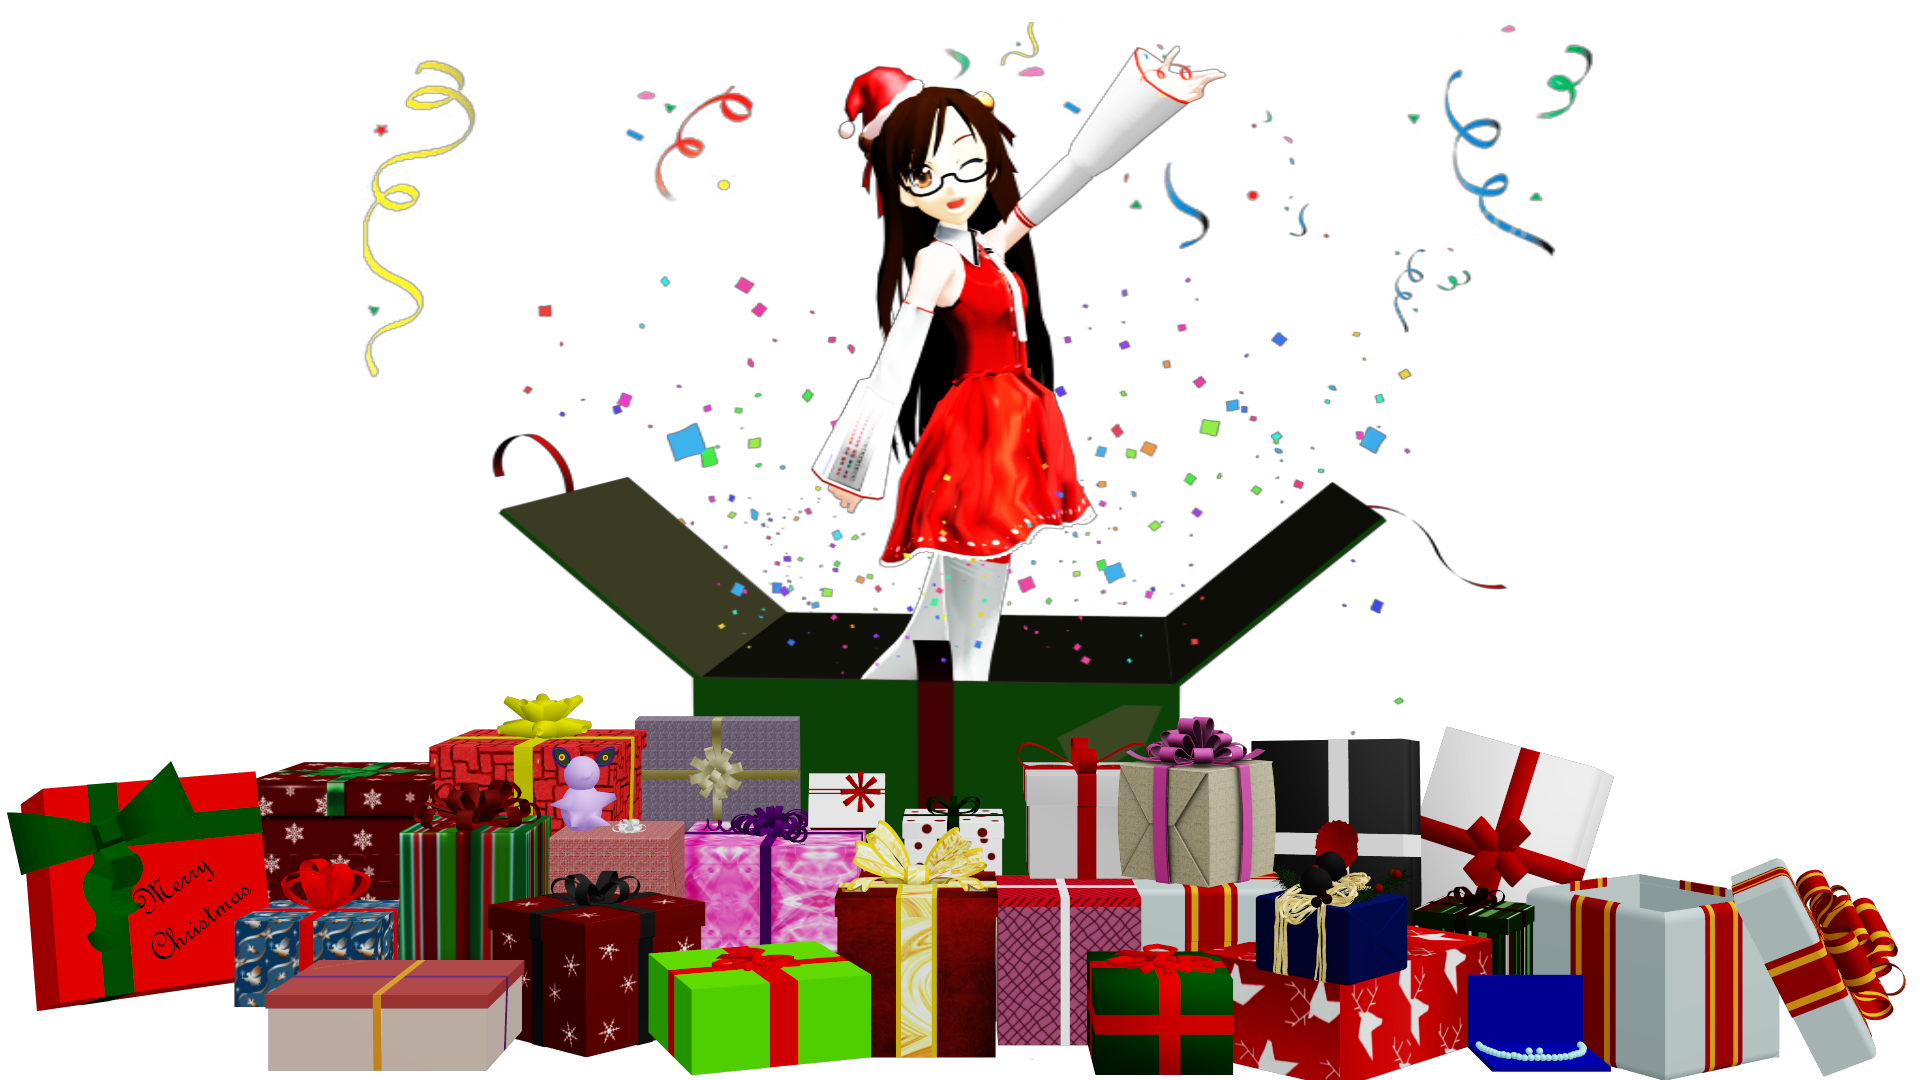 MMD] 25 Presents Pack DL by OniMau619 on DeviantArt